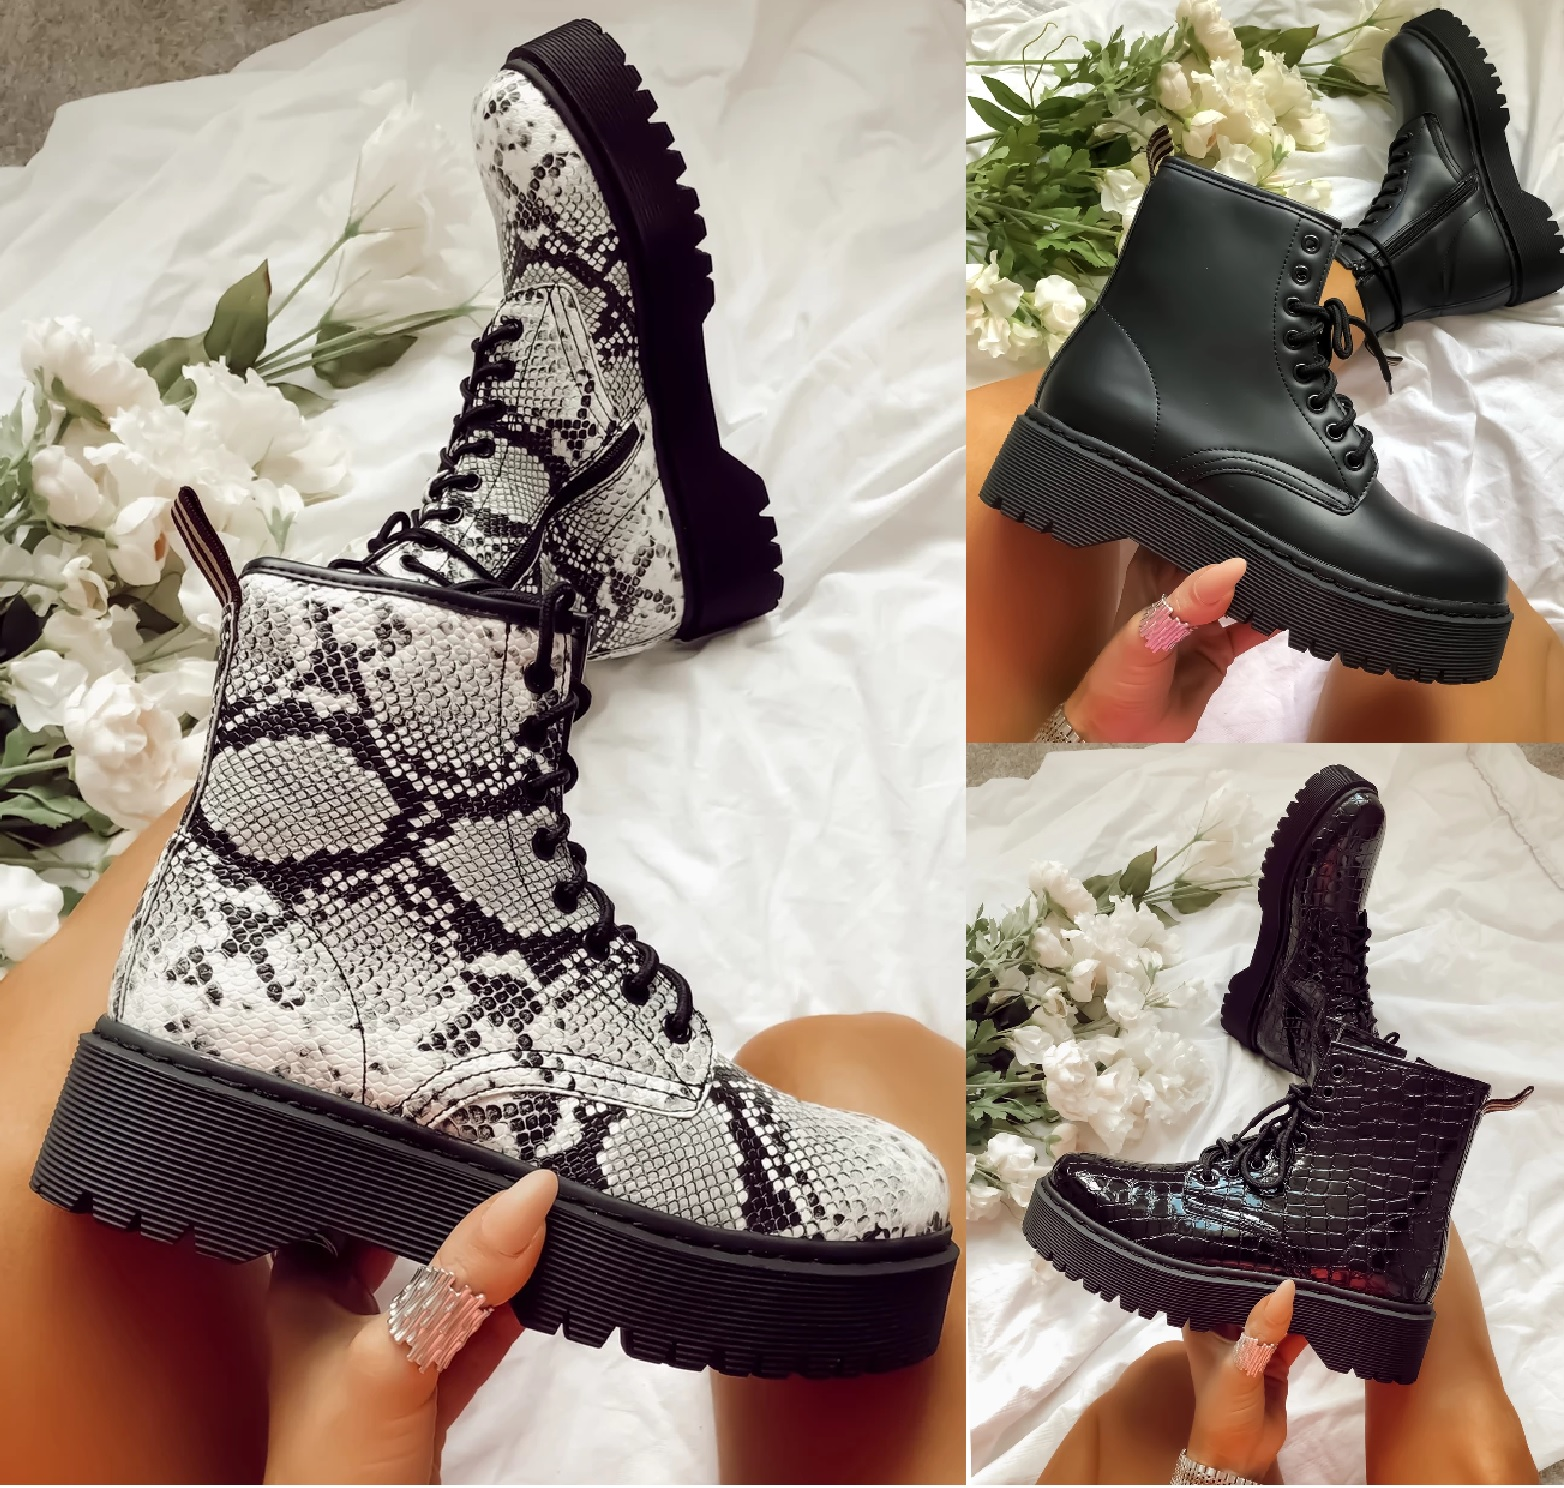 Femme Bottines Lacets Plateforme Chunky Punk Goth Zip Icône Rétro Chaussures Bottes